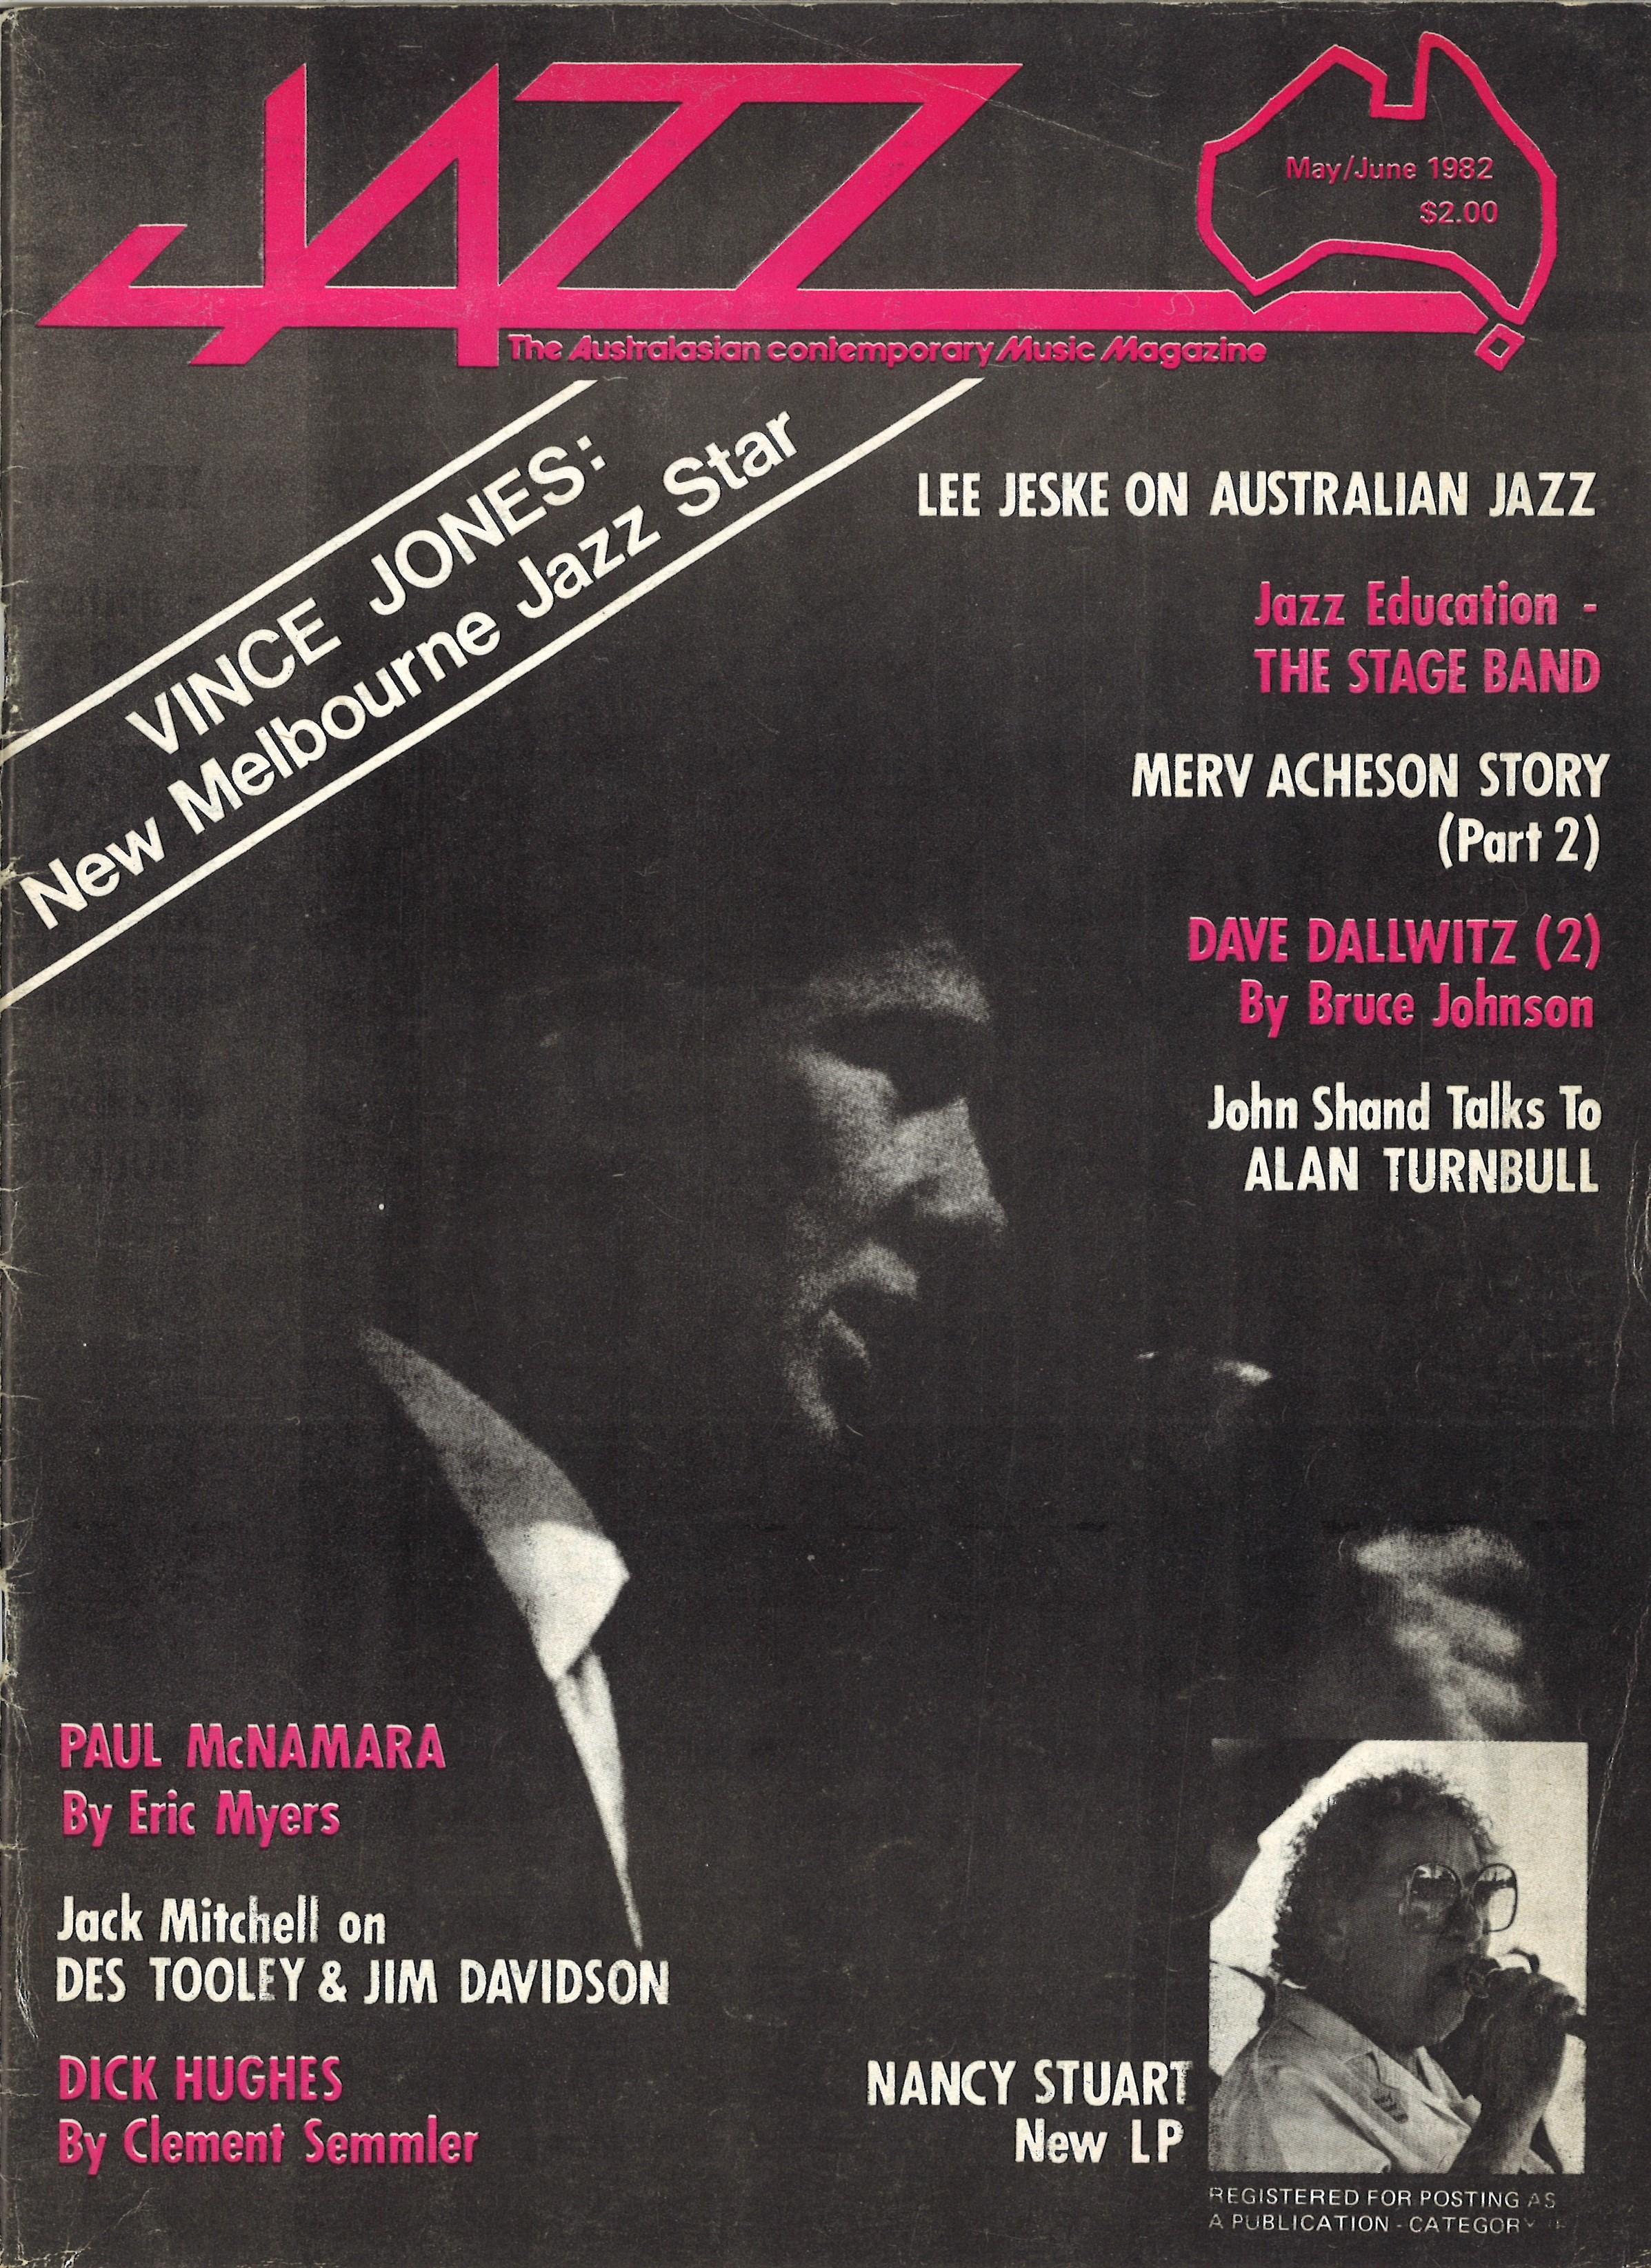 JazzMagazineMayJun82FrontCover.jpg